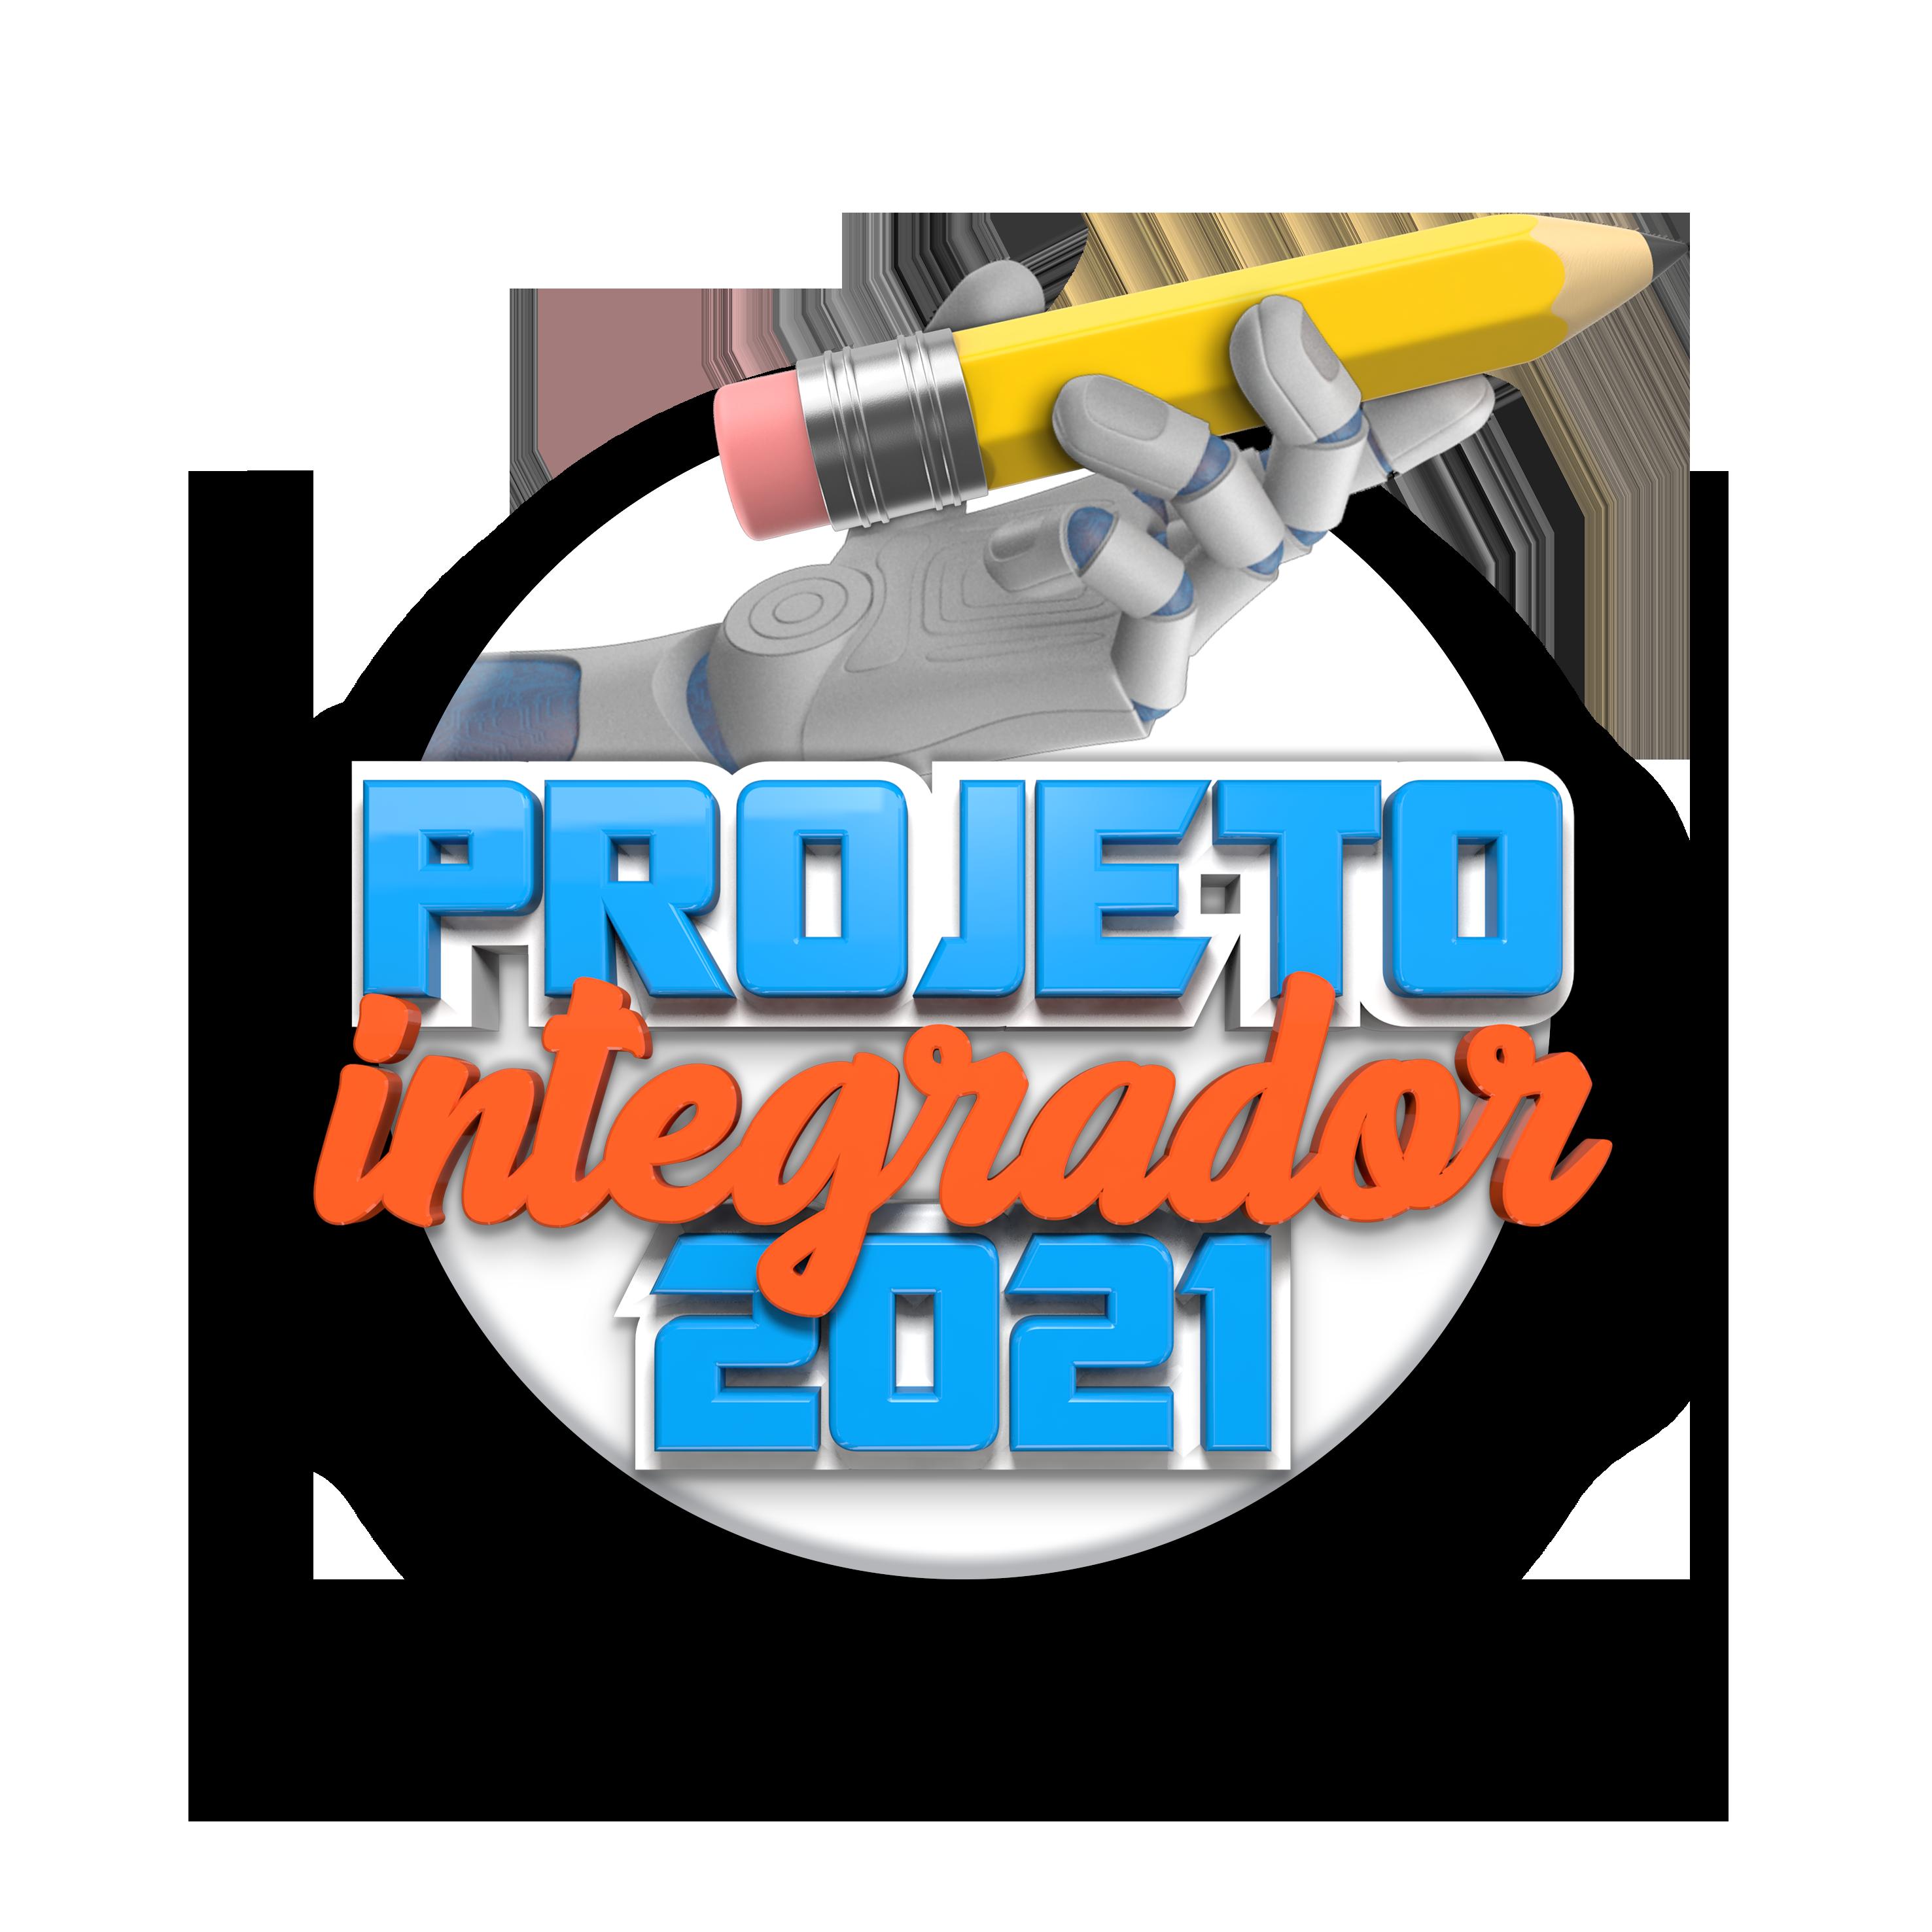 Projeto Integrador 2021